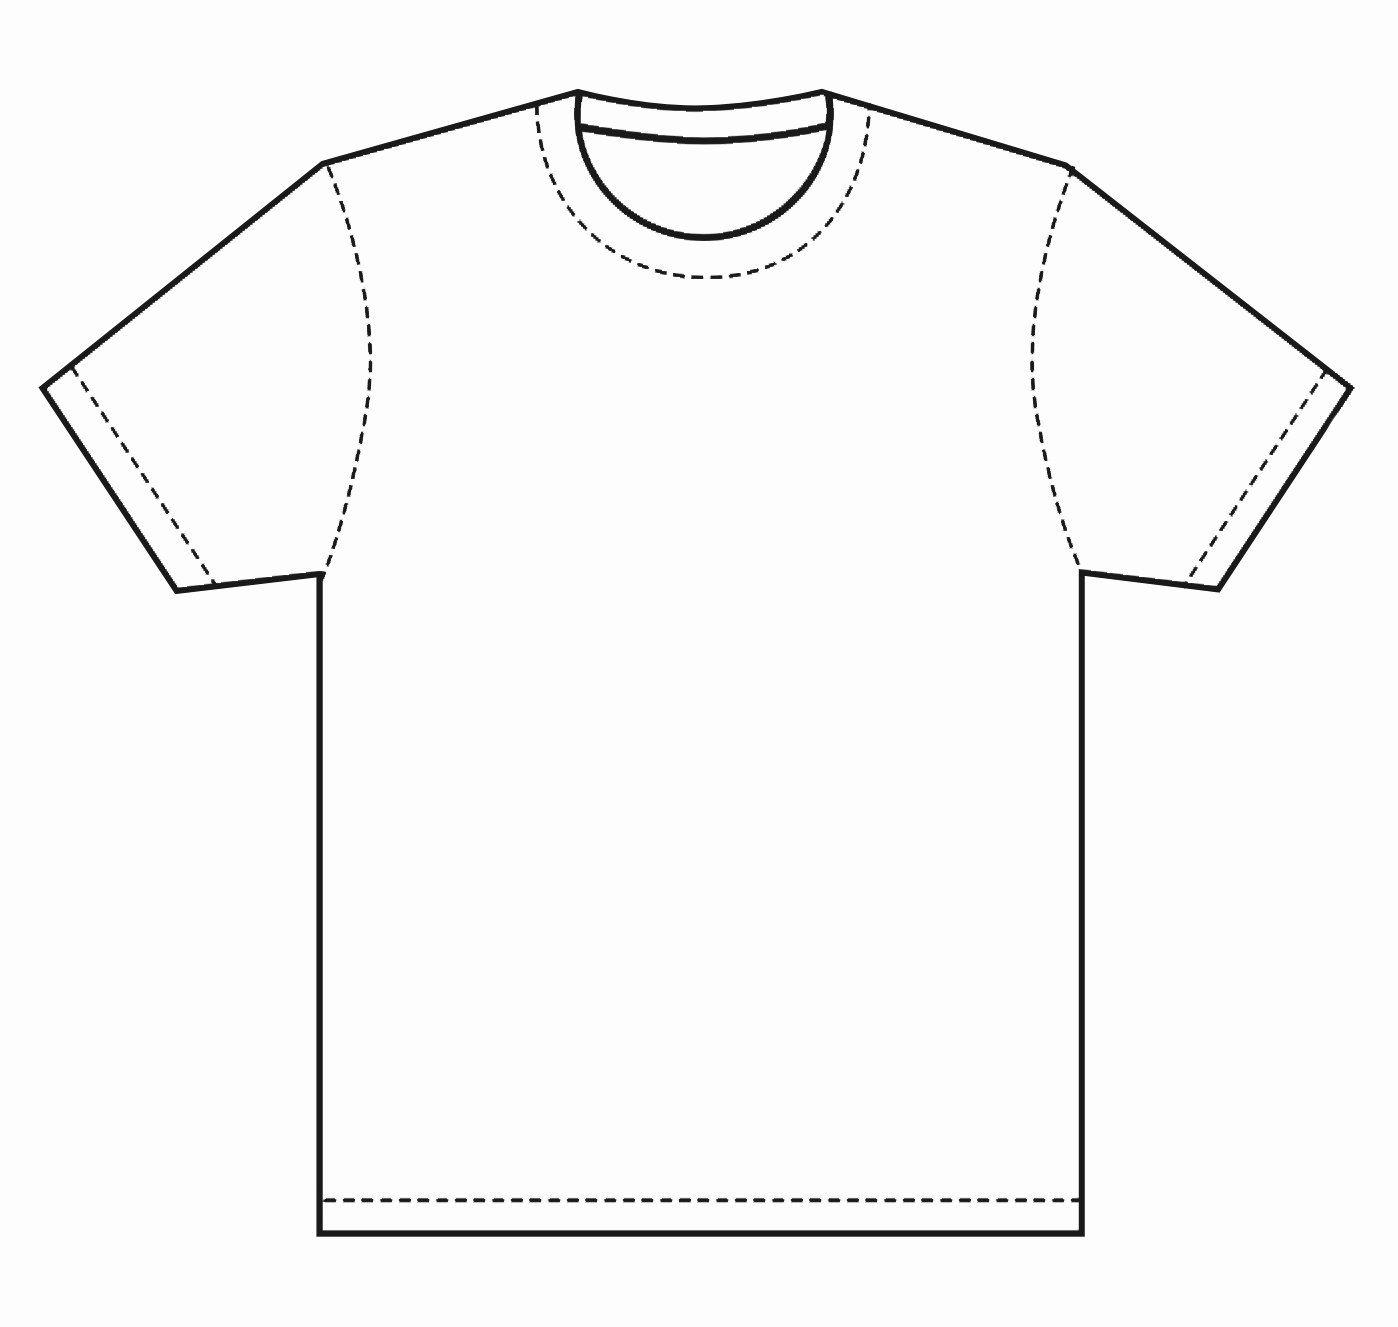 T Shirt Template Illustrator Lovely T Shirt Template Illustrator Shirt Sketch T Shirt Design Template Shirt Template